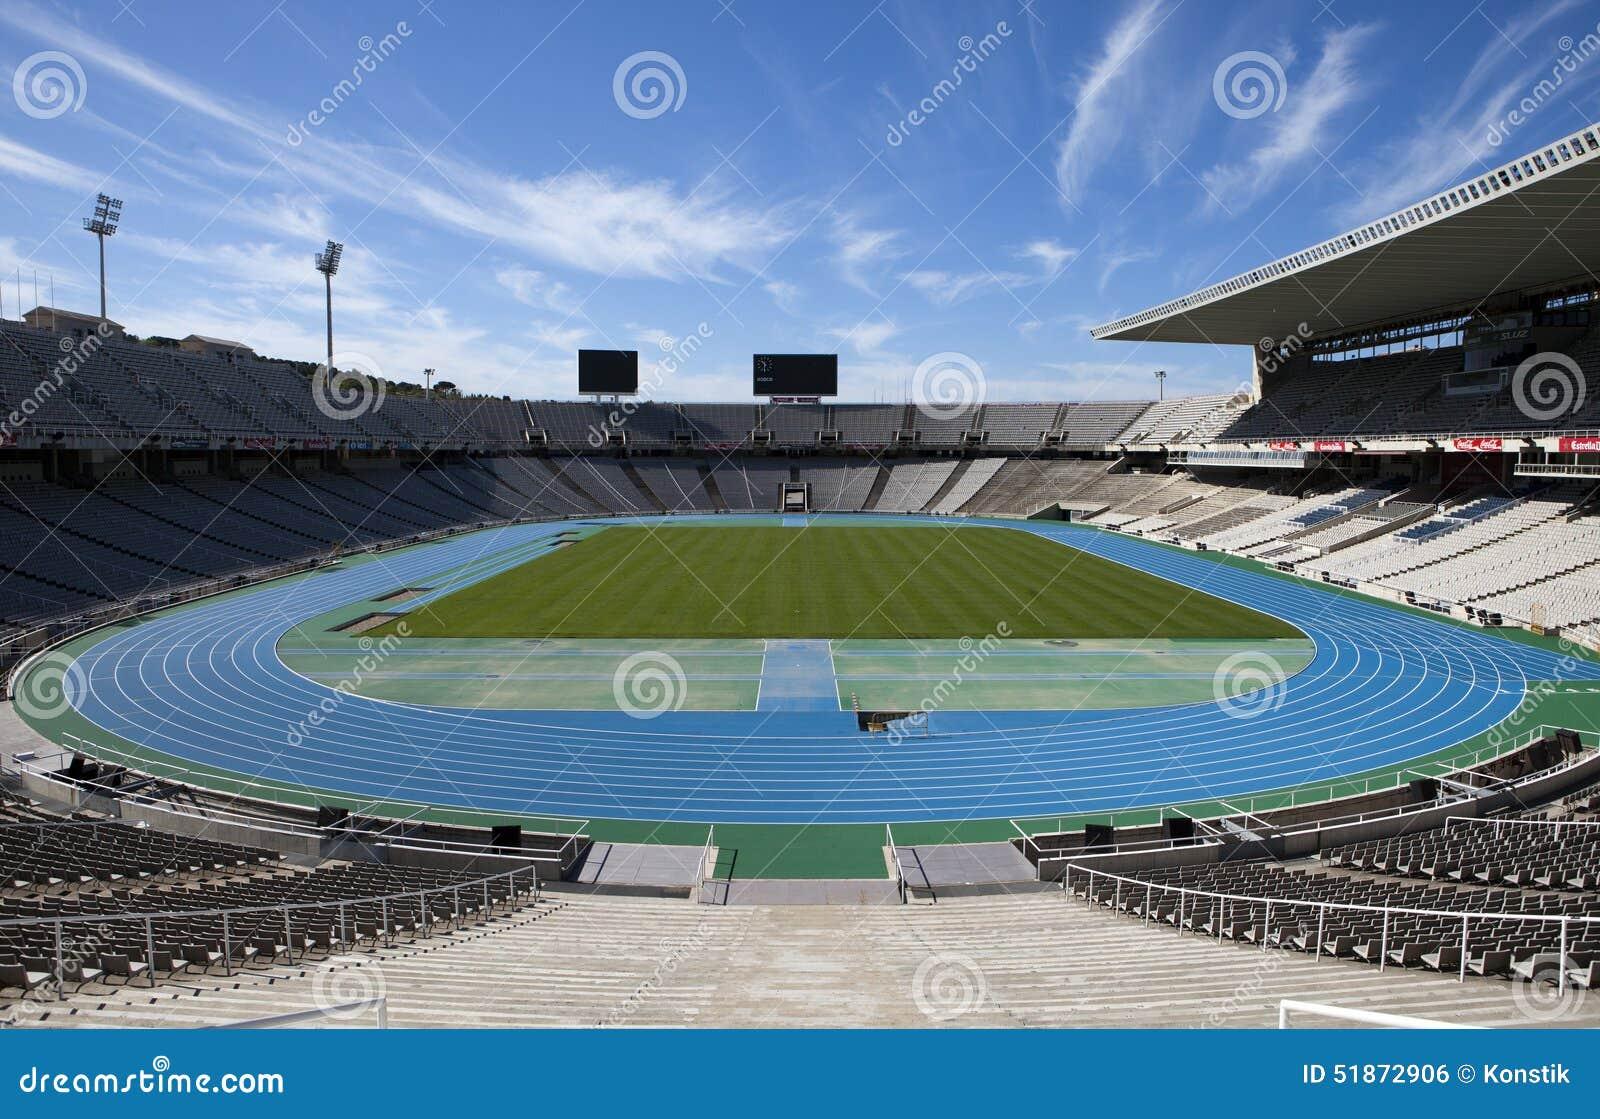 Estadi Olimpic Lluis Companys (Barcelone le Stade Olympique) le 10 mai 2010 à Barcelone, Espagne